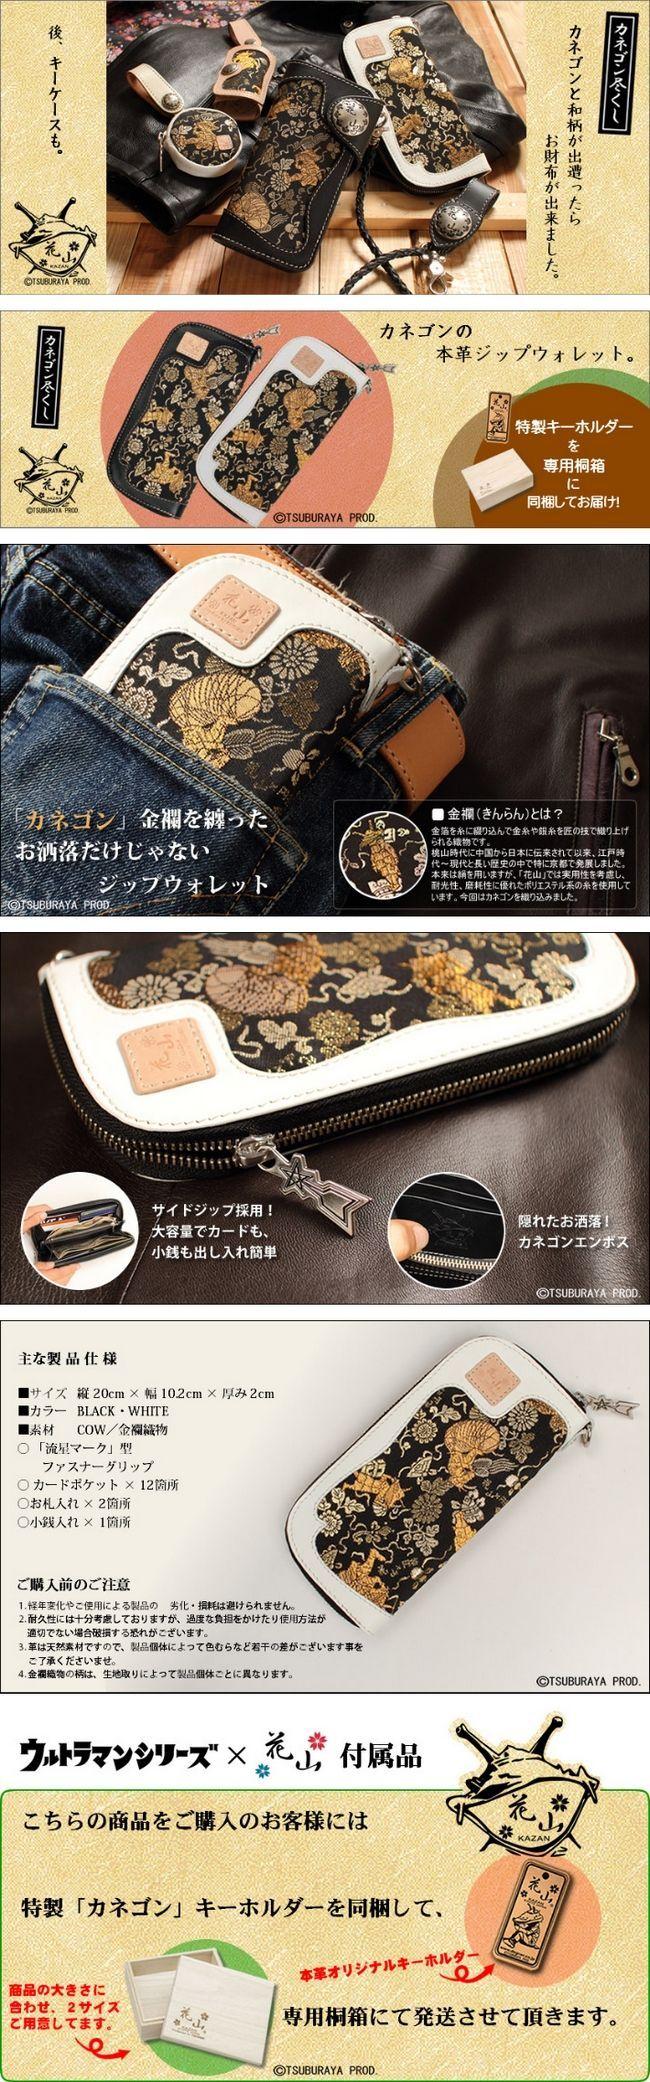 【DEGNER】Ultra SeriesX花山 拉鍊長錢包 - 「Webike-摩托百貨」